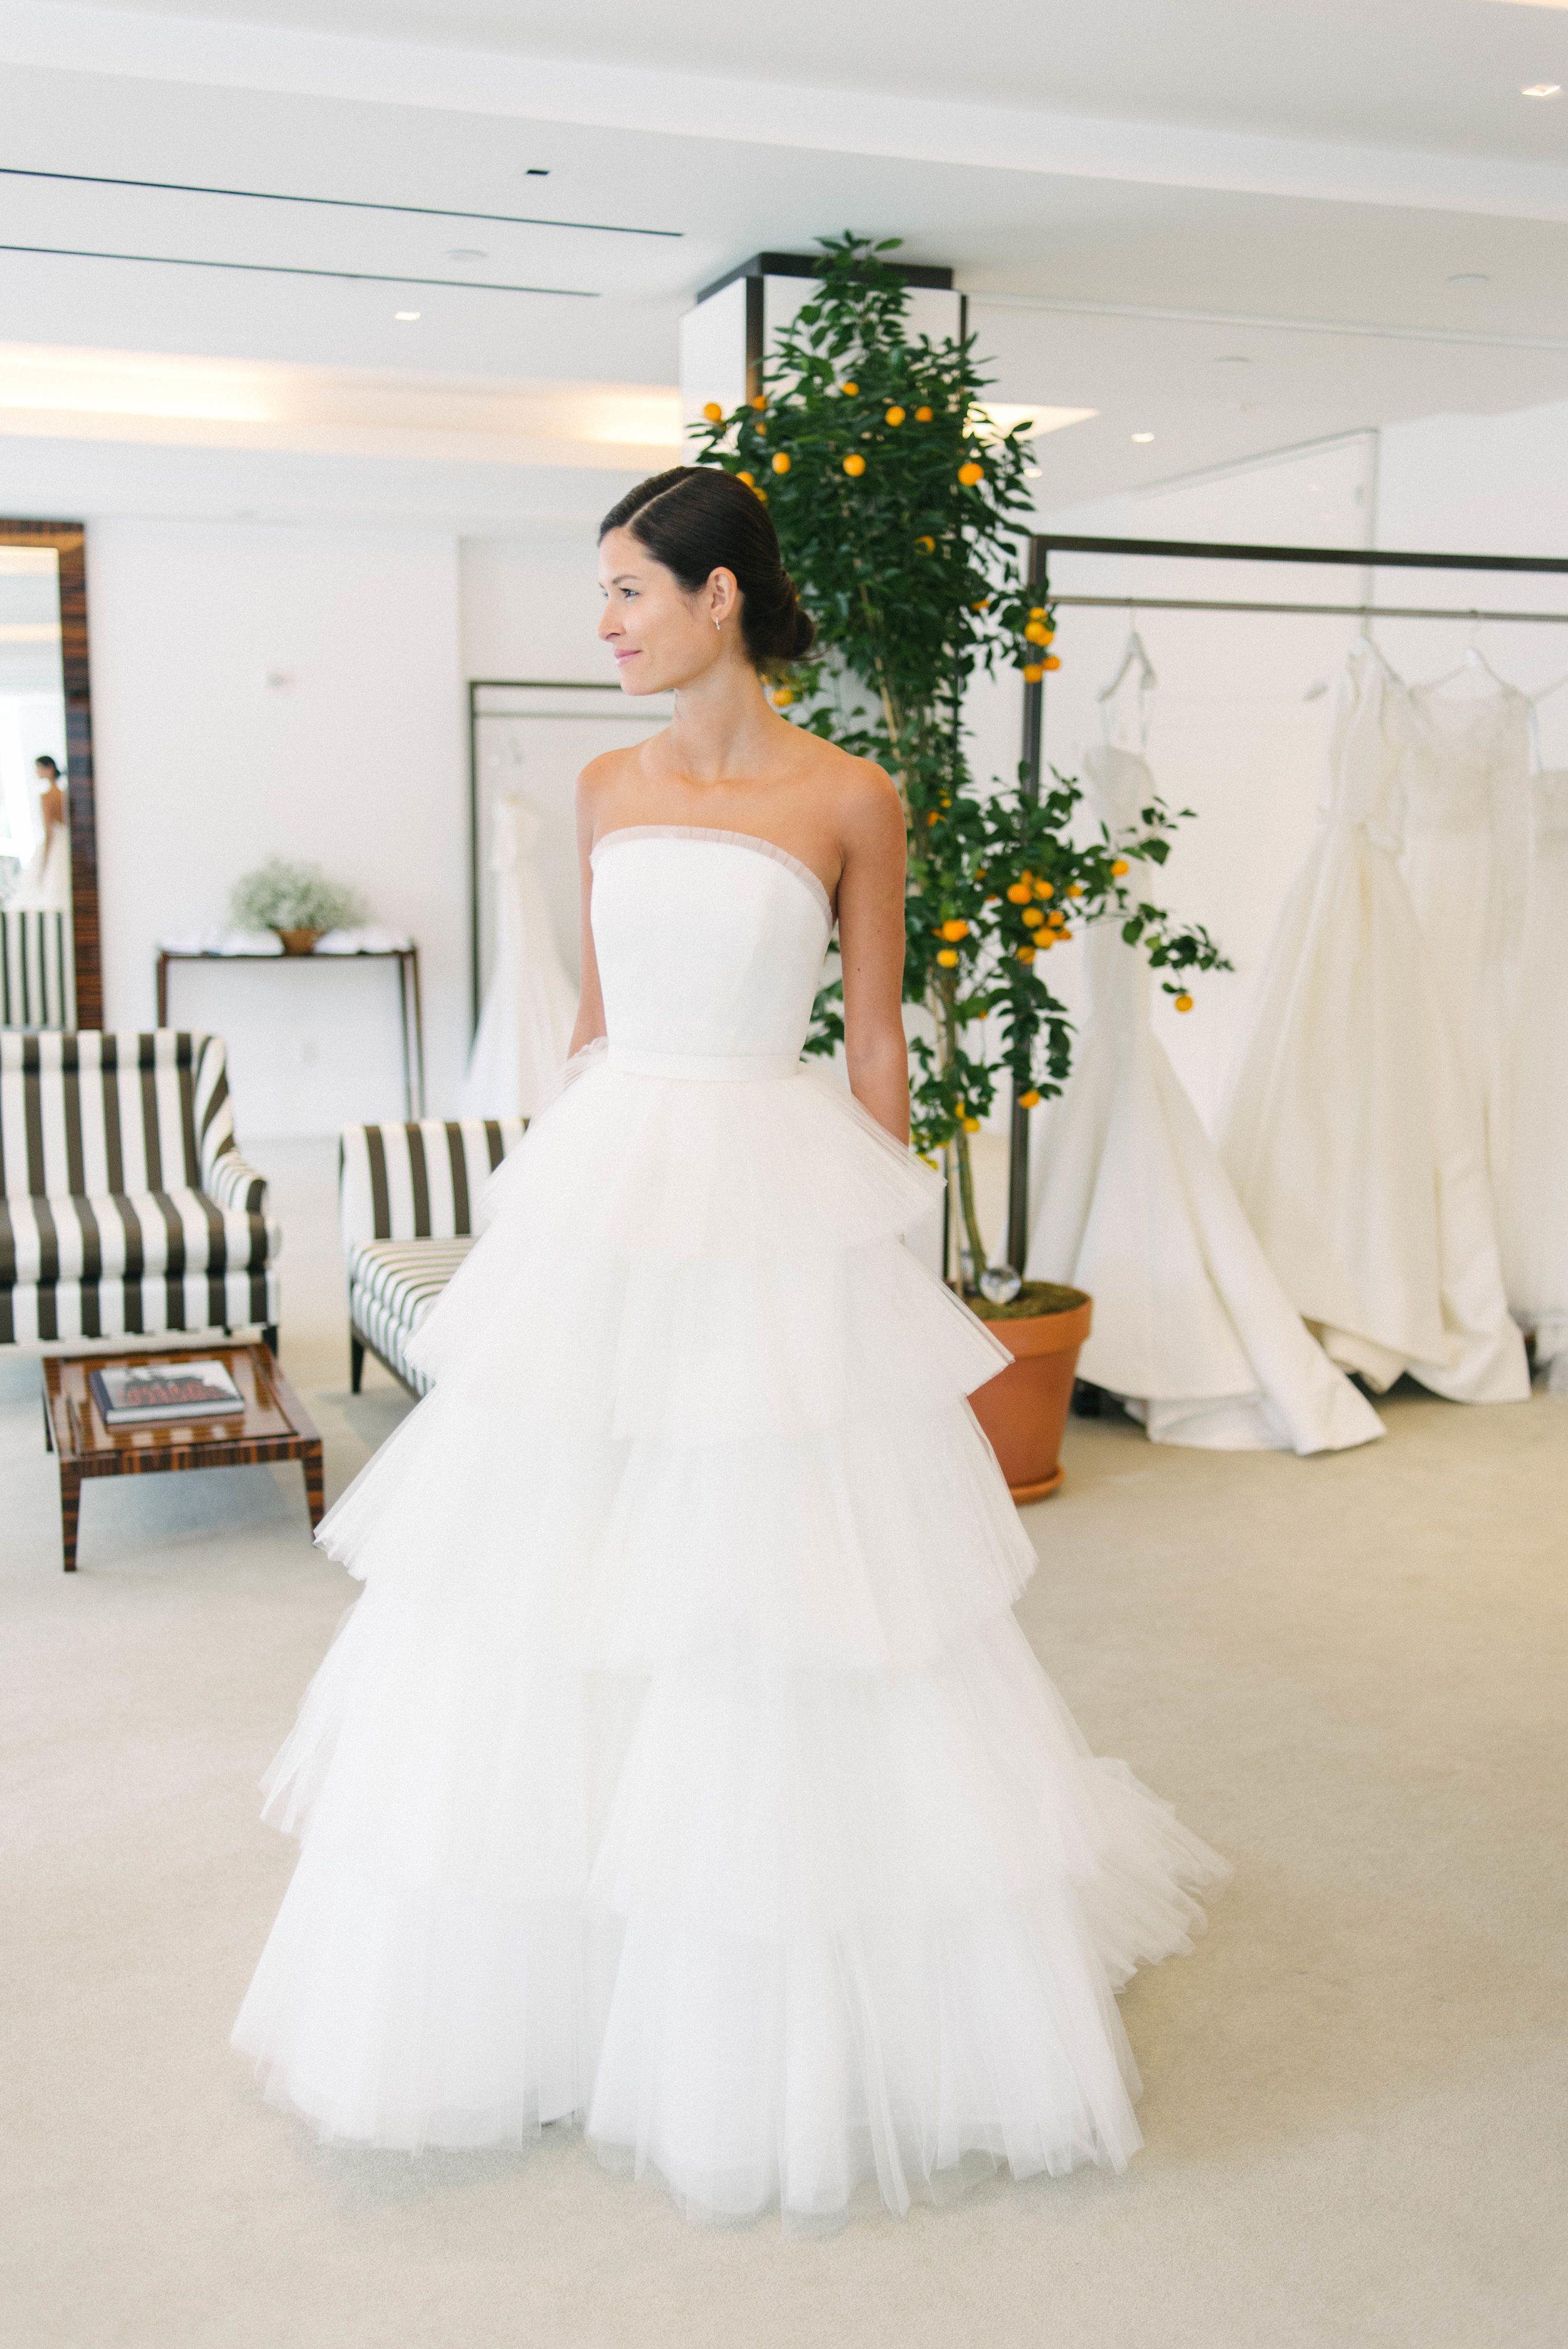 Carolina Herrera Spring 2020 Collection Preview Wedding Dresses